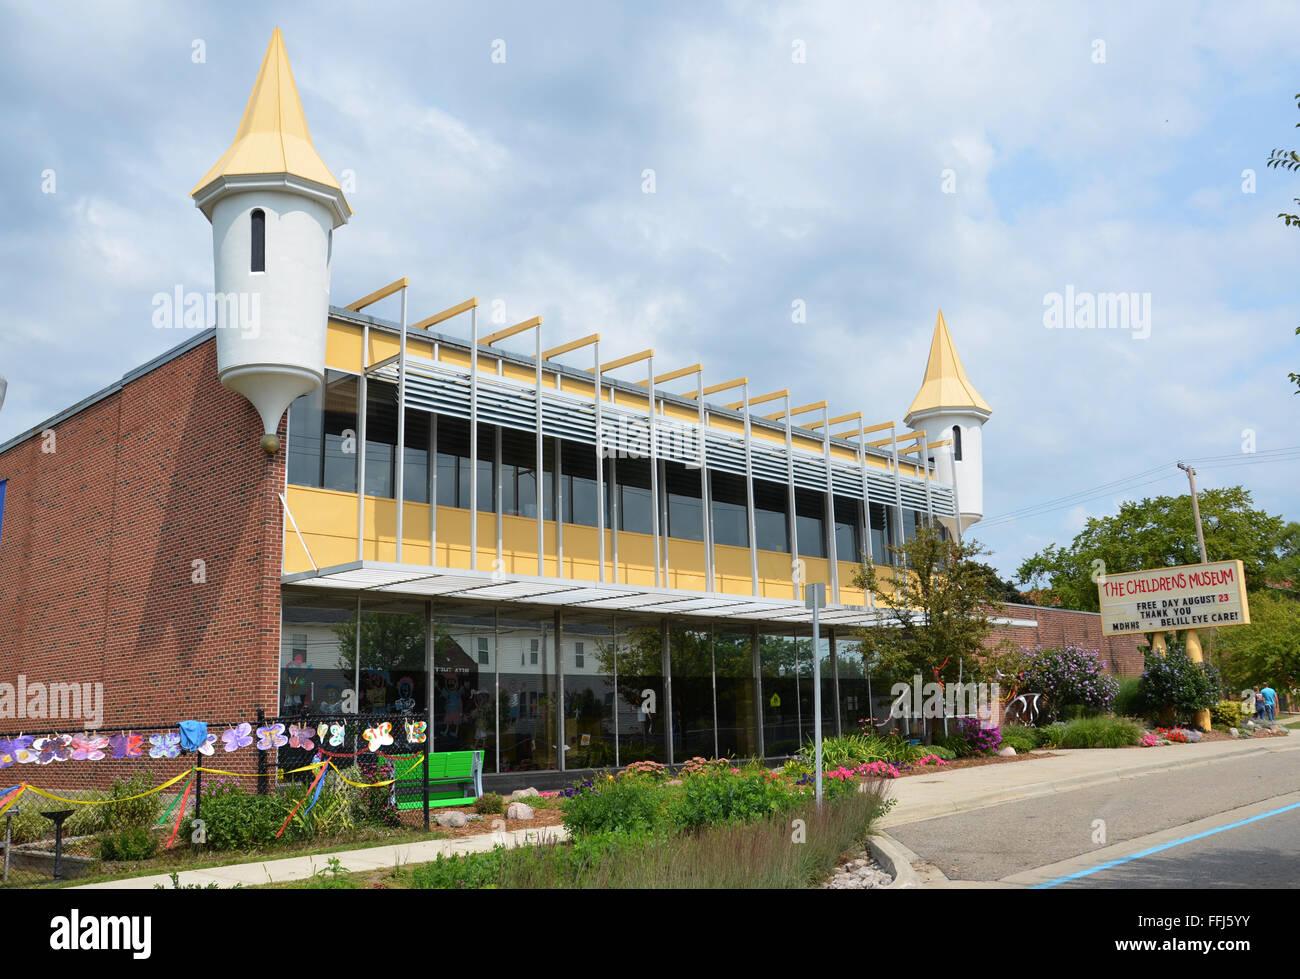 FLINT, MI - AUGUST 22: Flint, Michigan's Children Museum is shown here on August 22, 2015. - Stock Image